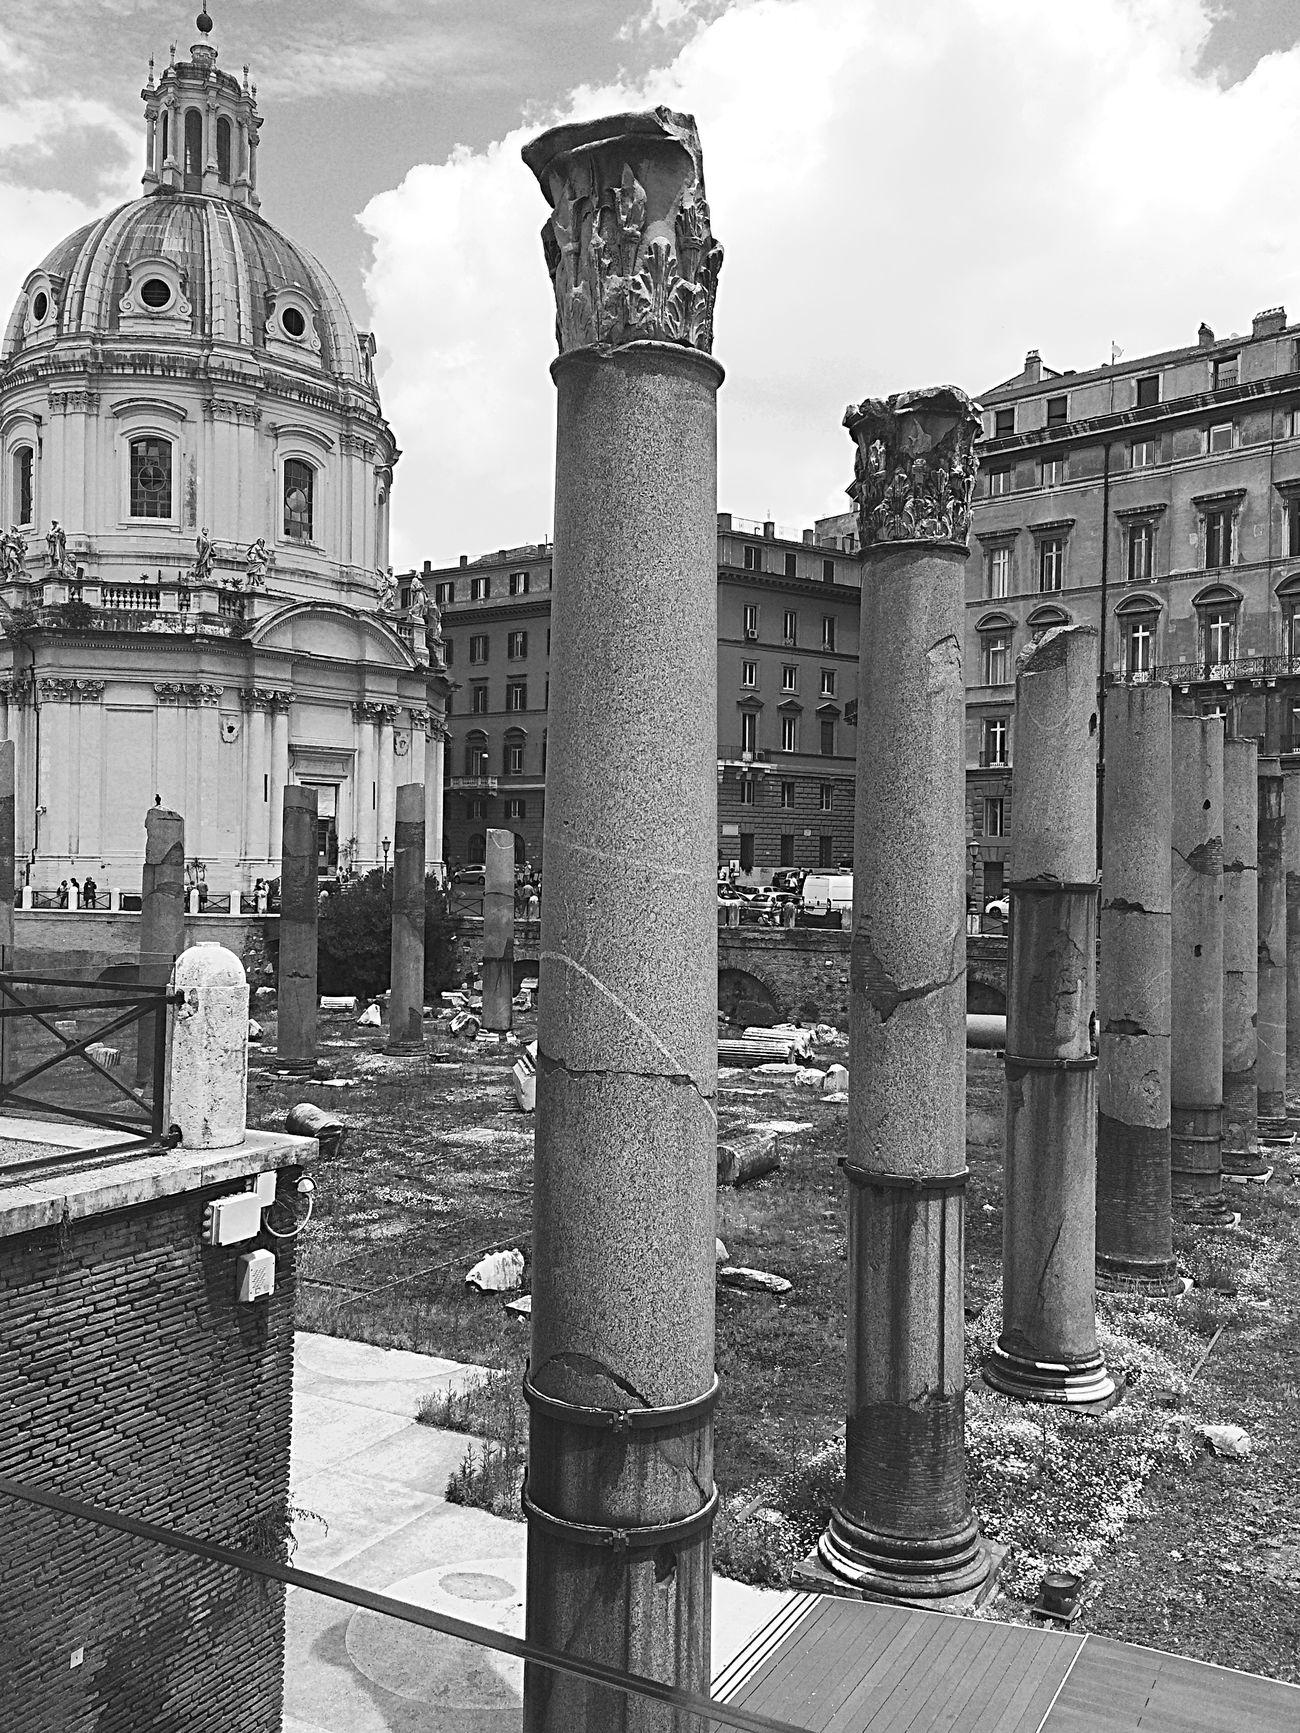 Roma ❤️ Architecture Sky City Architectural Column History Statue Roma Antique Life World